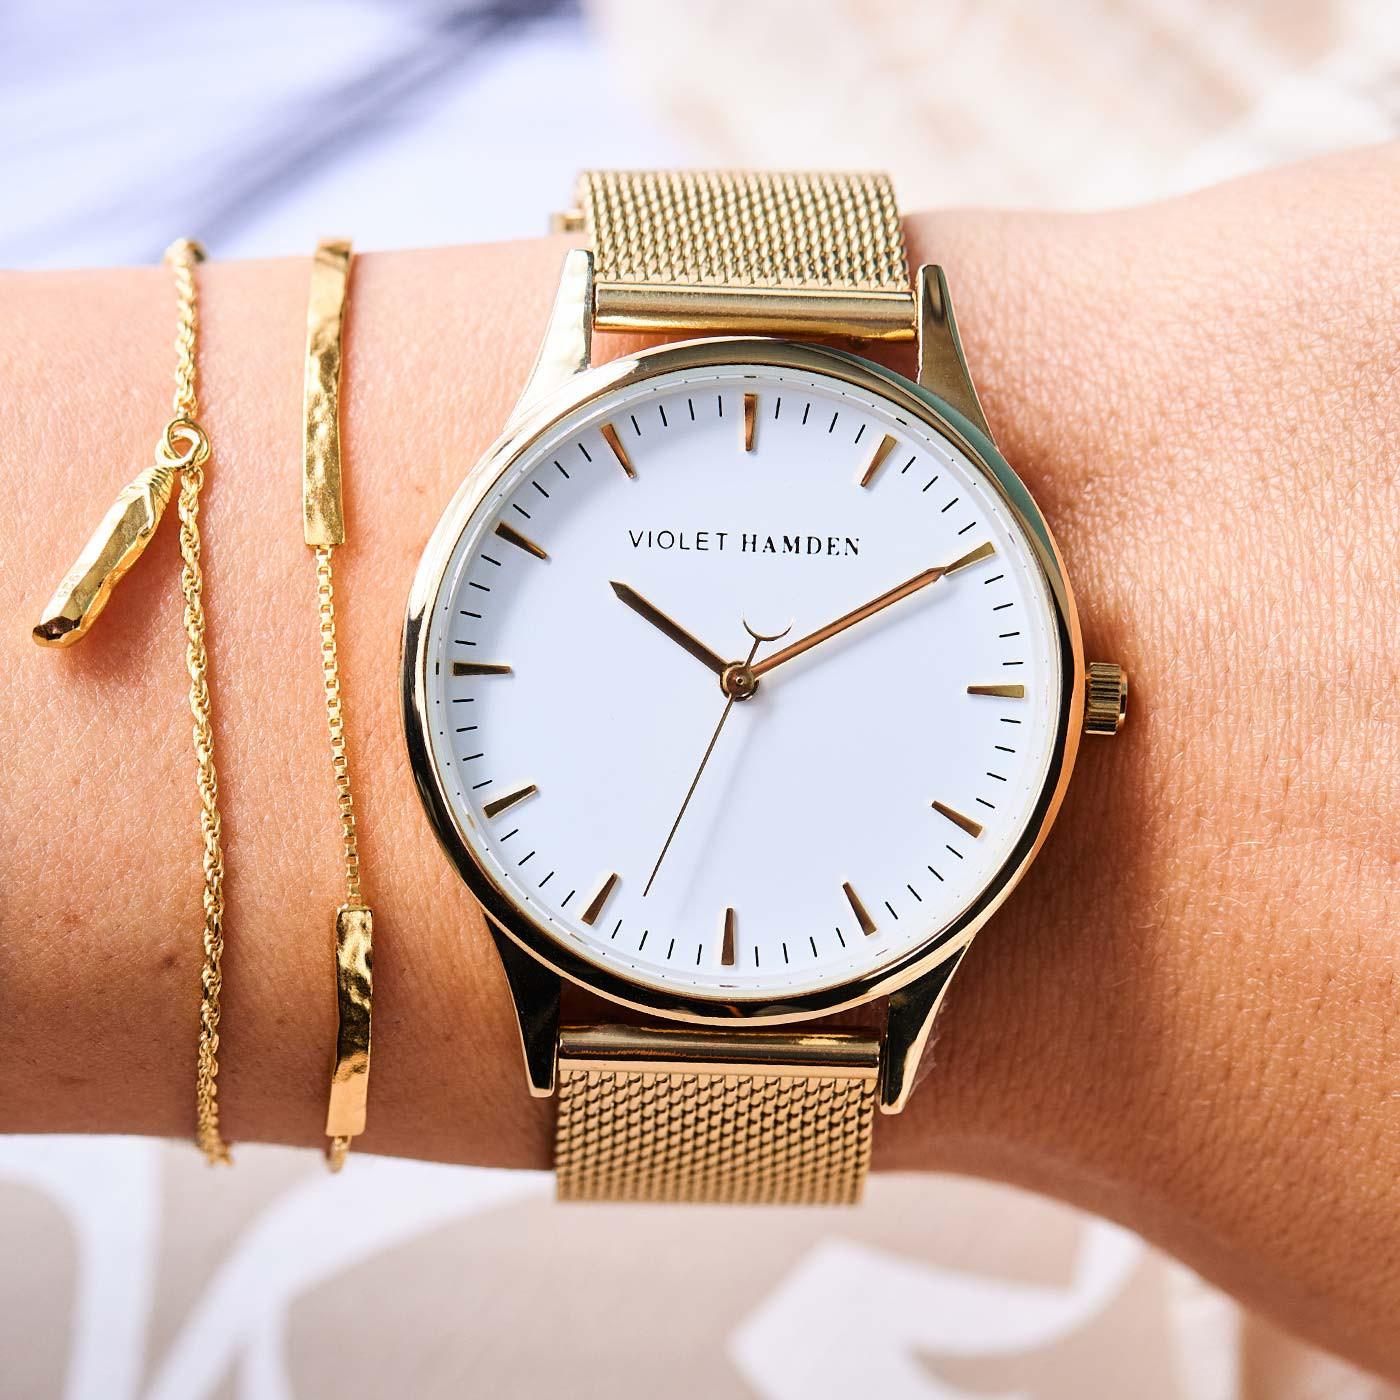 Violet Hamden Nowness Gold Colored/White horloge VH05027